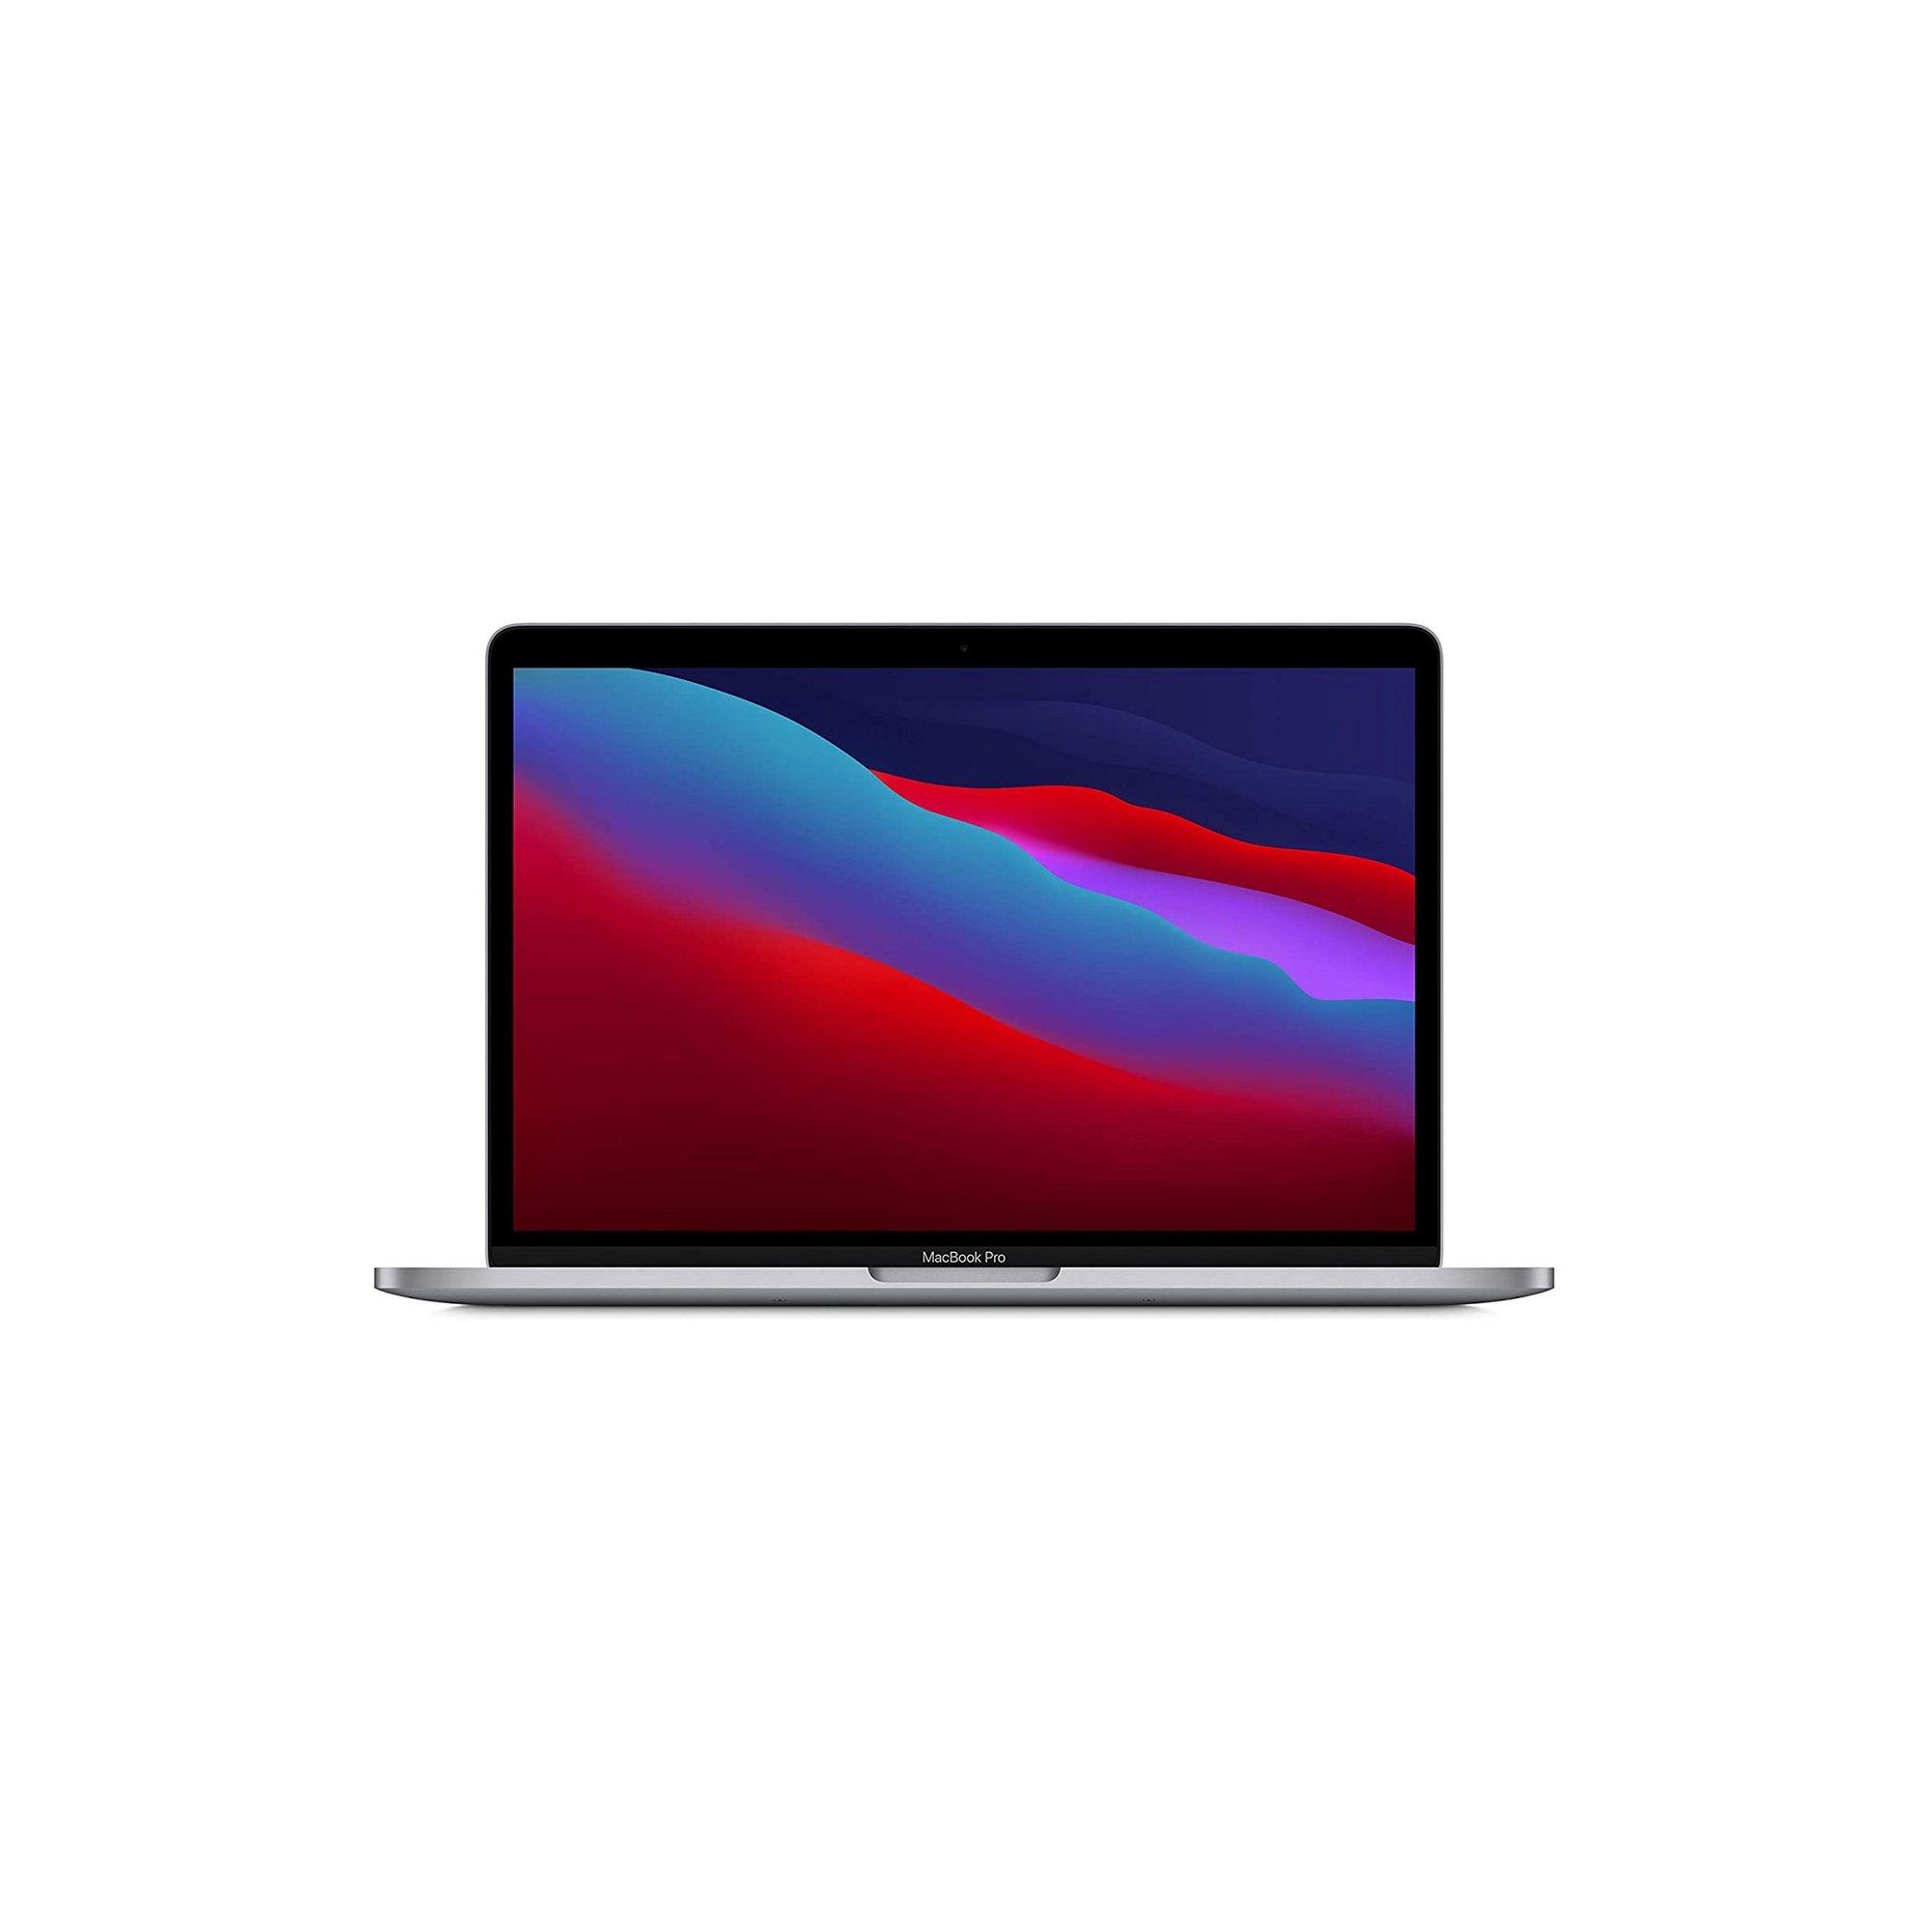 Image of Apple MacBook Pro 13 Inch M1 Chip 2020 256GB